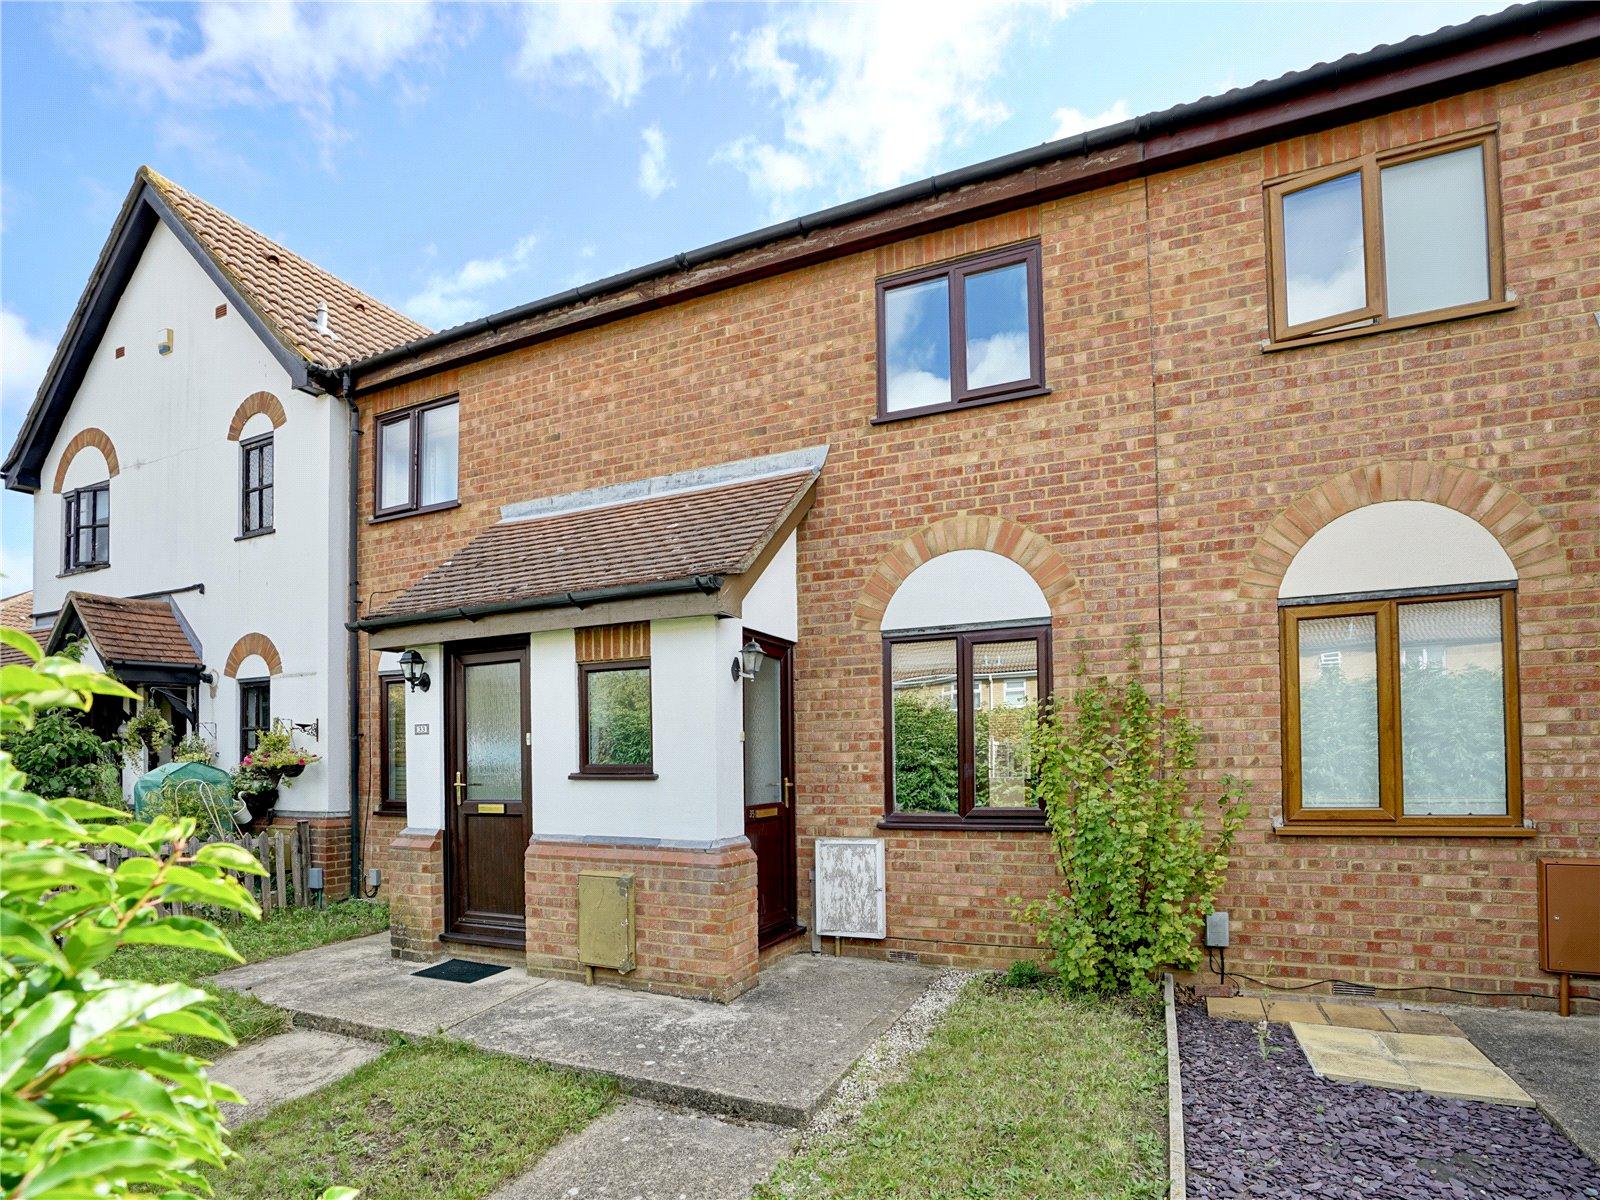 2 bed house for sale in Eynesbury, Lindisfarne Close, PE19 2UT, PE19